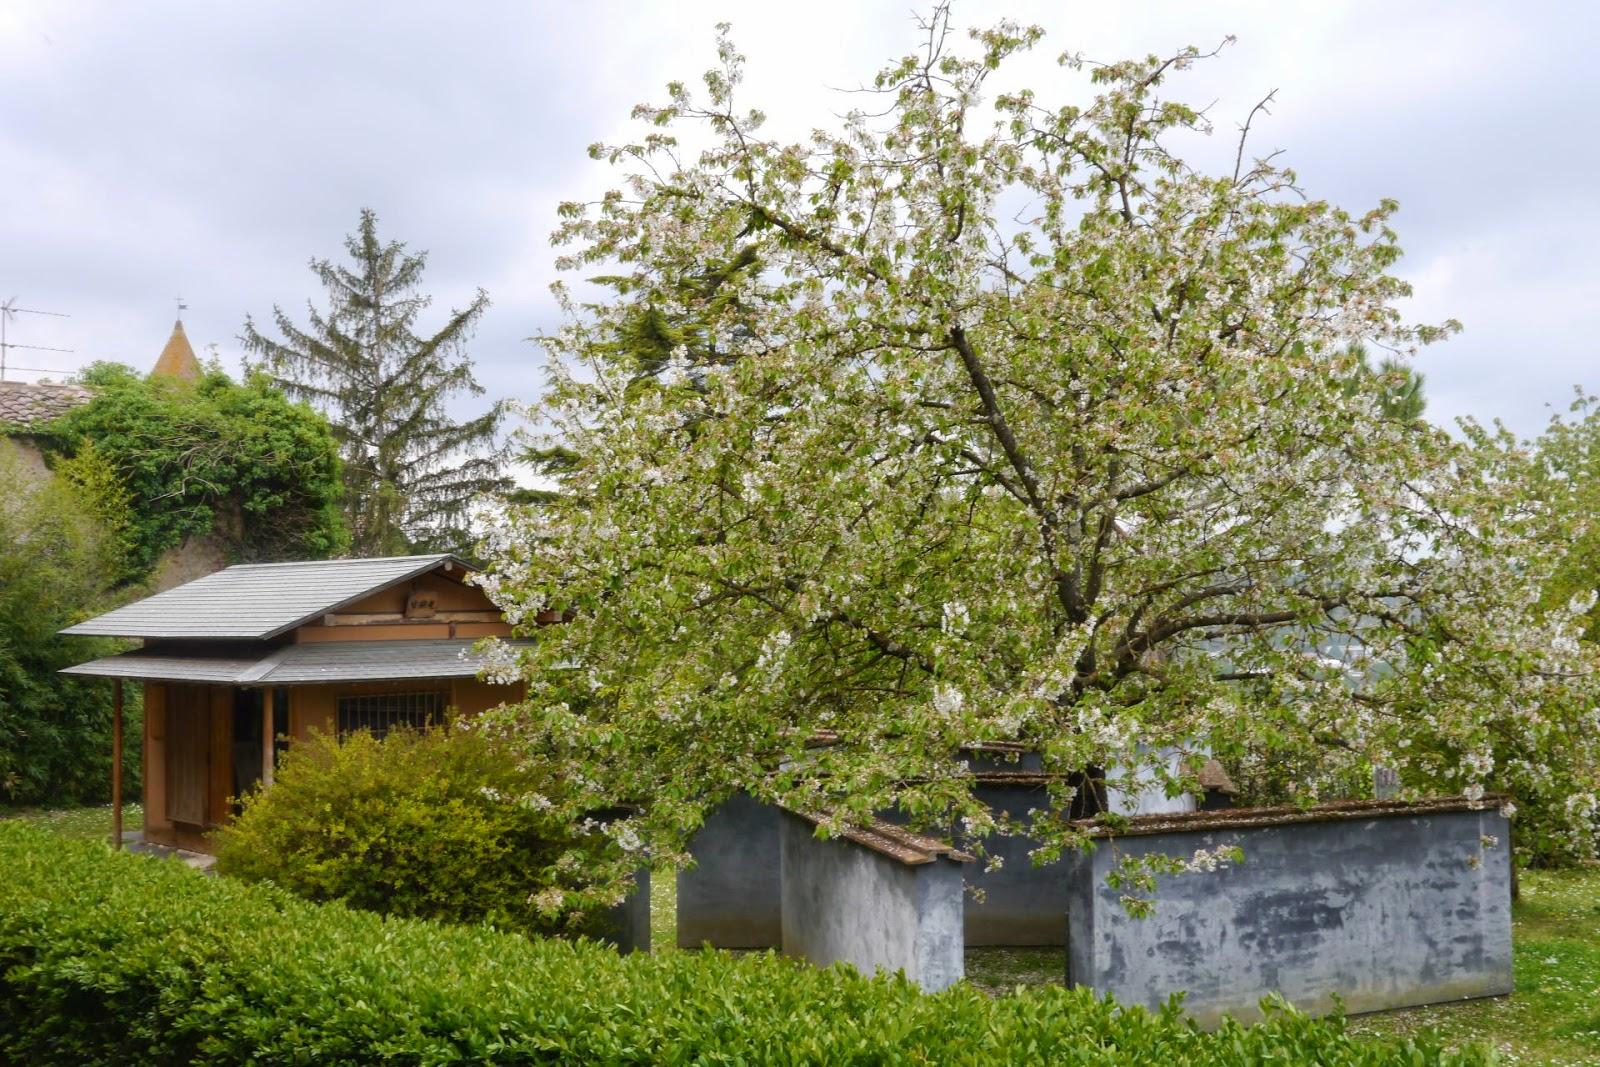 Girovagando due giardini giapponesi in toscana - Giardini giapponesi ...